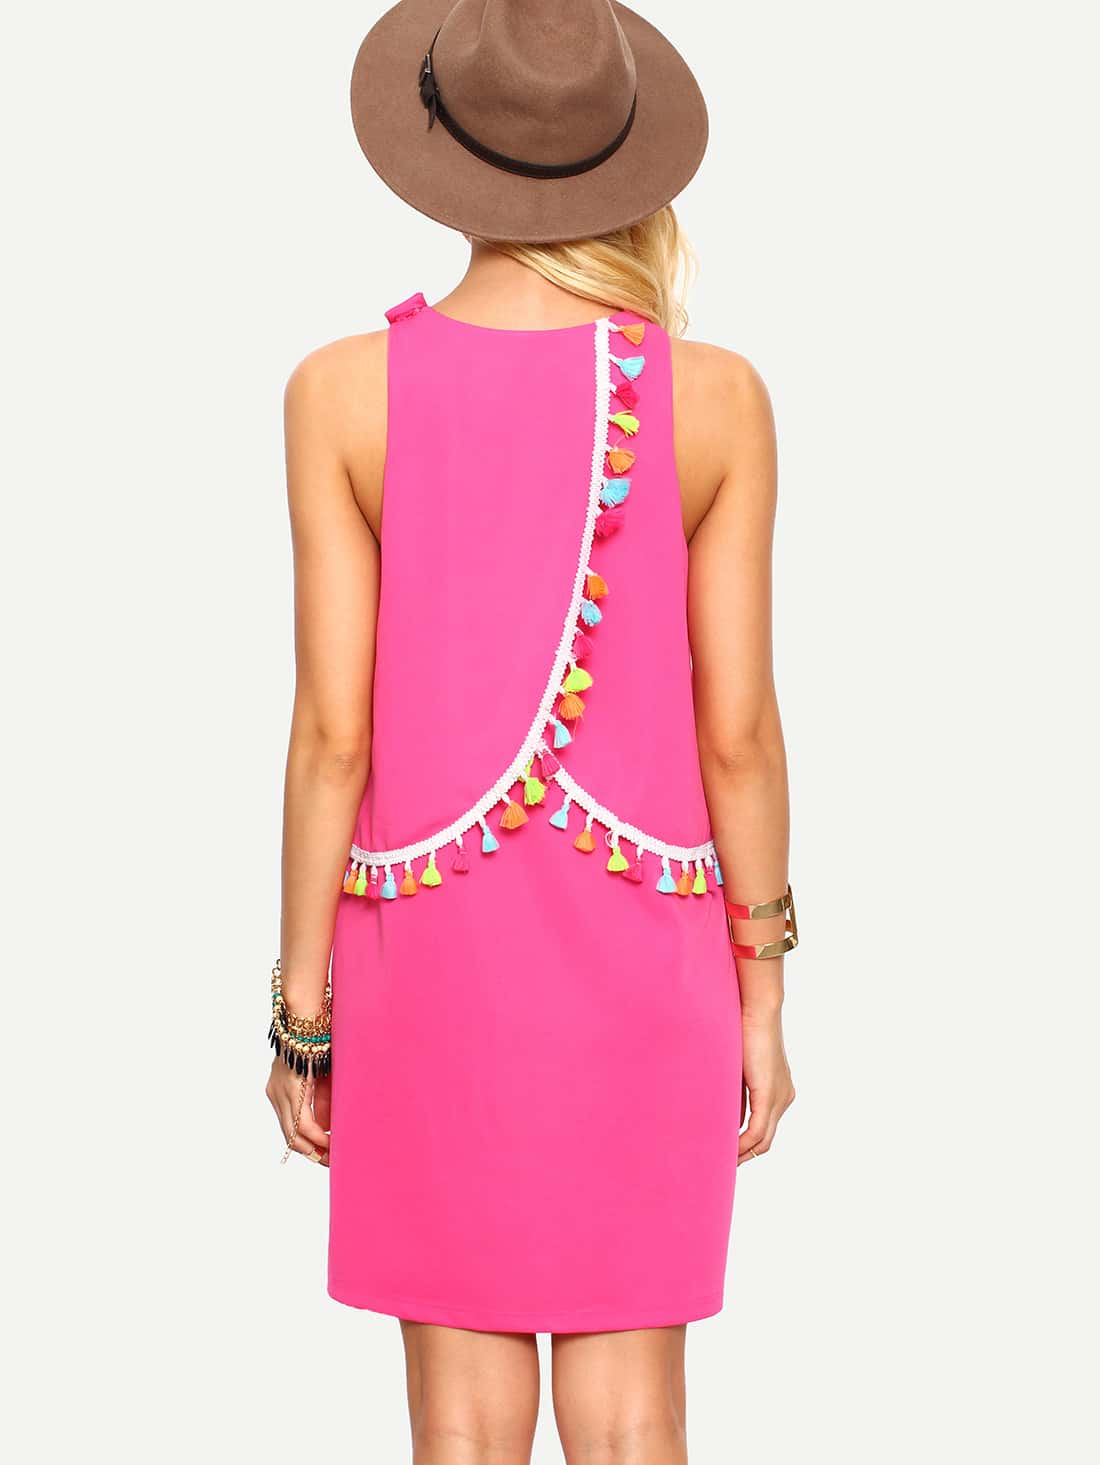 Fullsize Of Hot Pink Dress